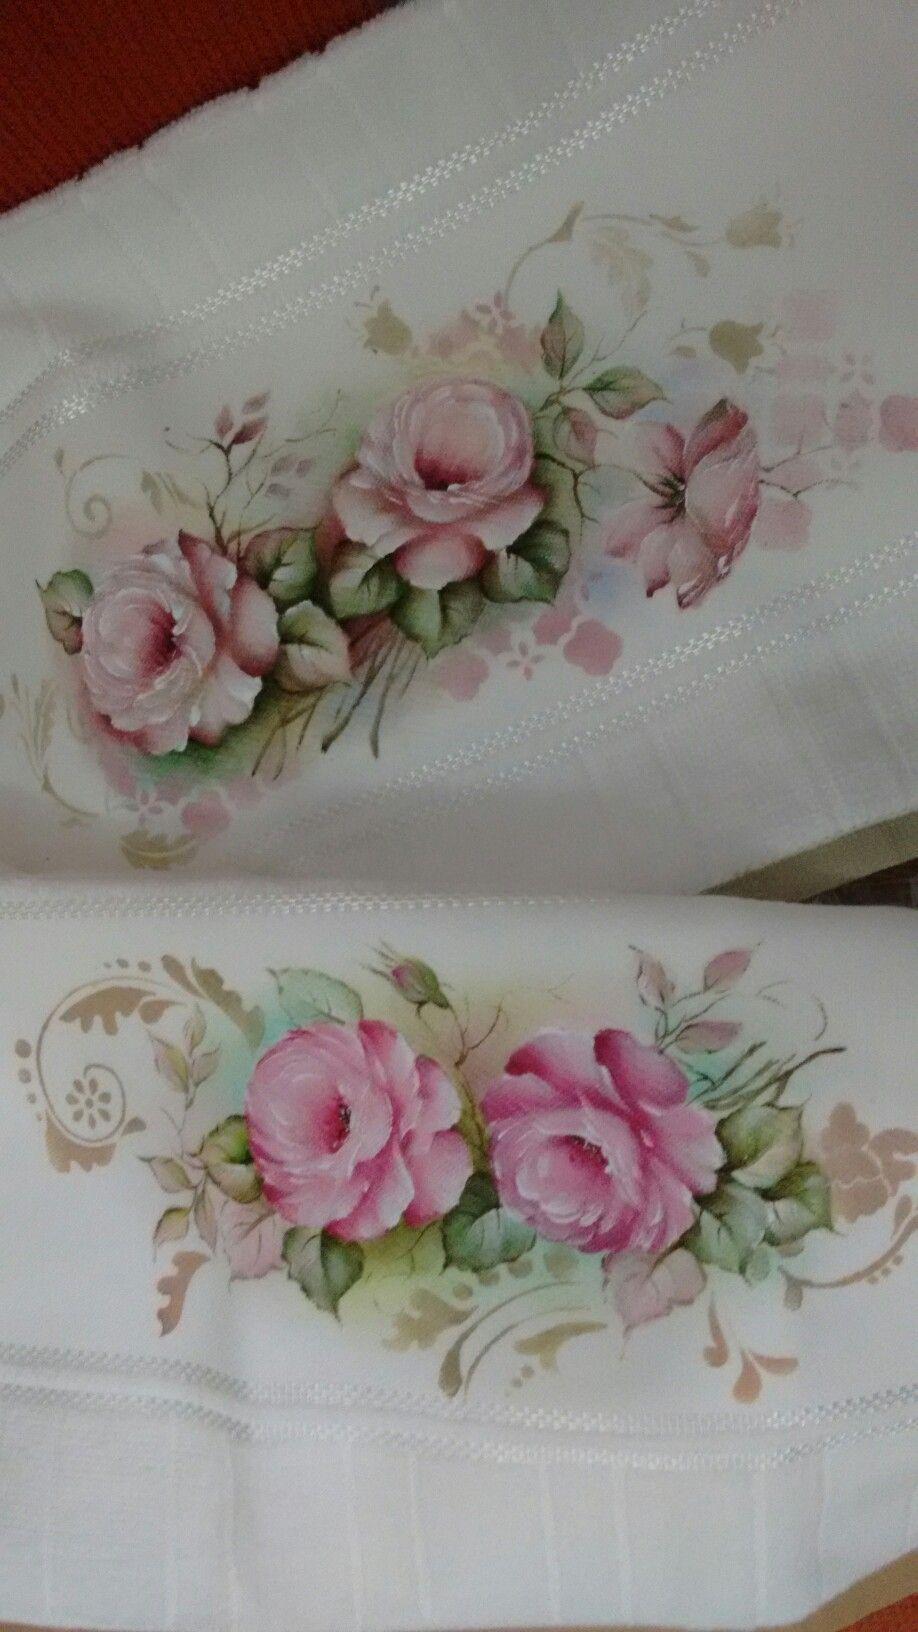 Pintura em toalhas por Tânia Pompermayer #pinturadecorativa